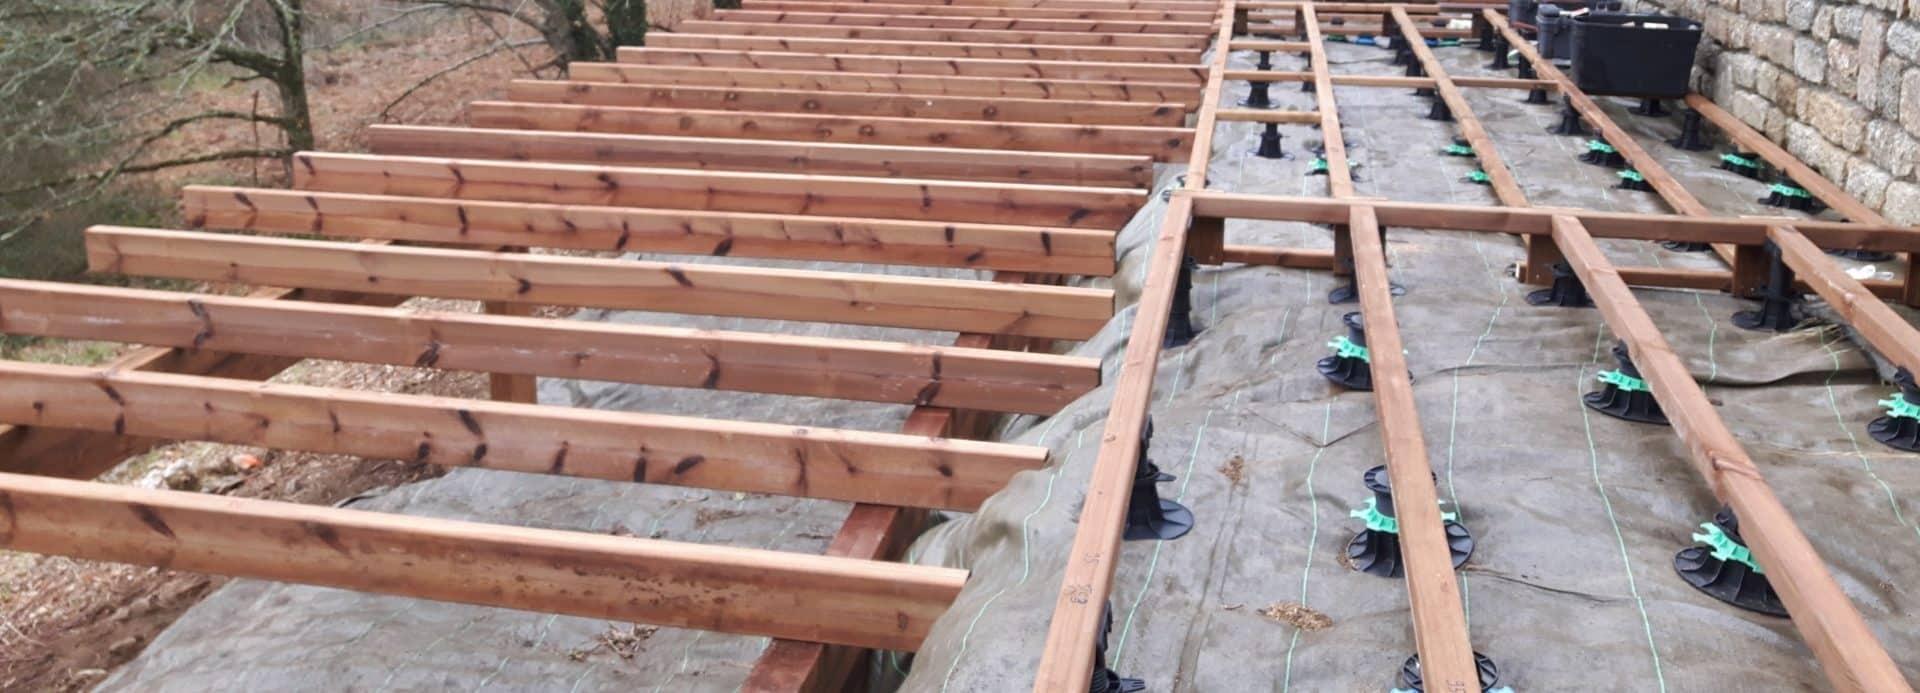 extension 2 - Terrasses au sol